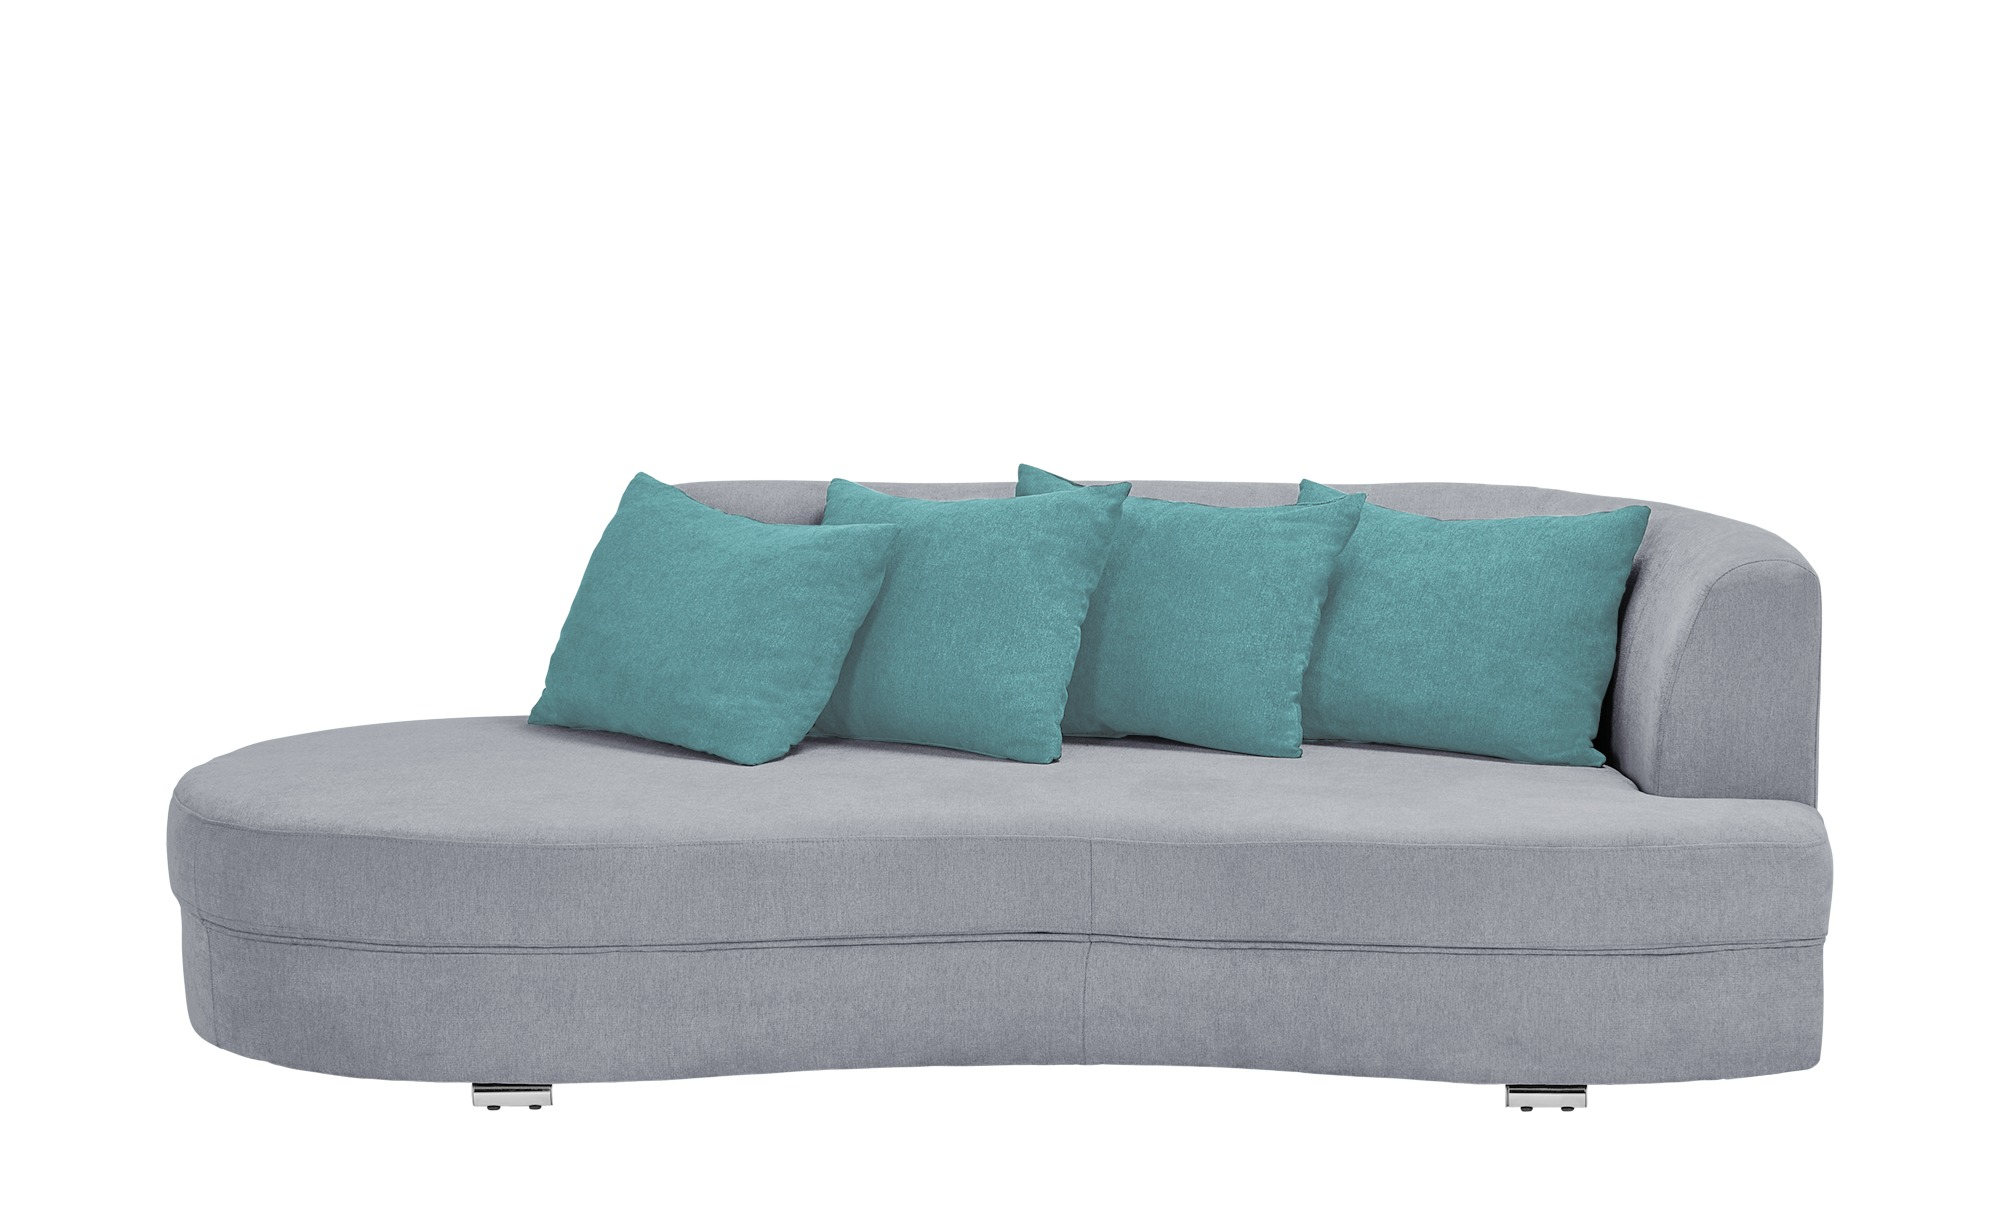 smart Big Sofa silber - Flachgewebe Marina ¦ silber ¦ Maße (cm): B: 211 H: 69 T: 109 Polstermöbel > Sofas > Big-Sofas - Höffner